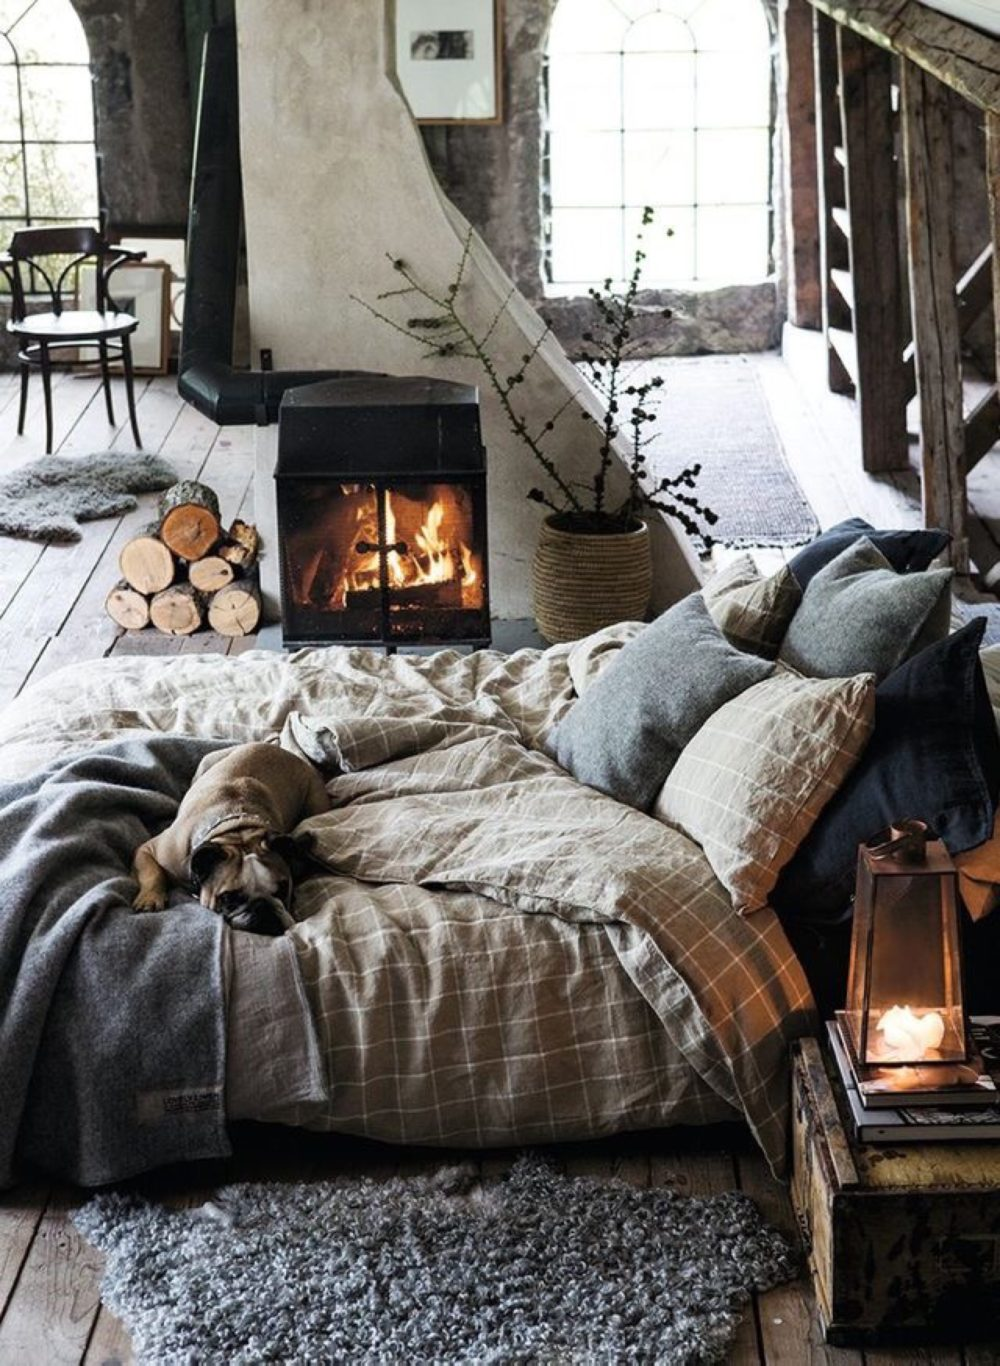 A Greener Bedroom - make your sleep healthier & more eco-friendly